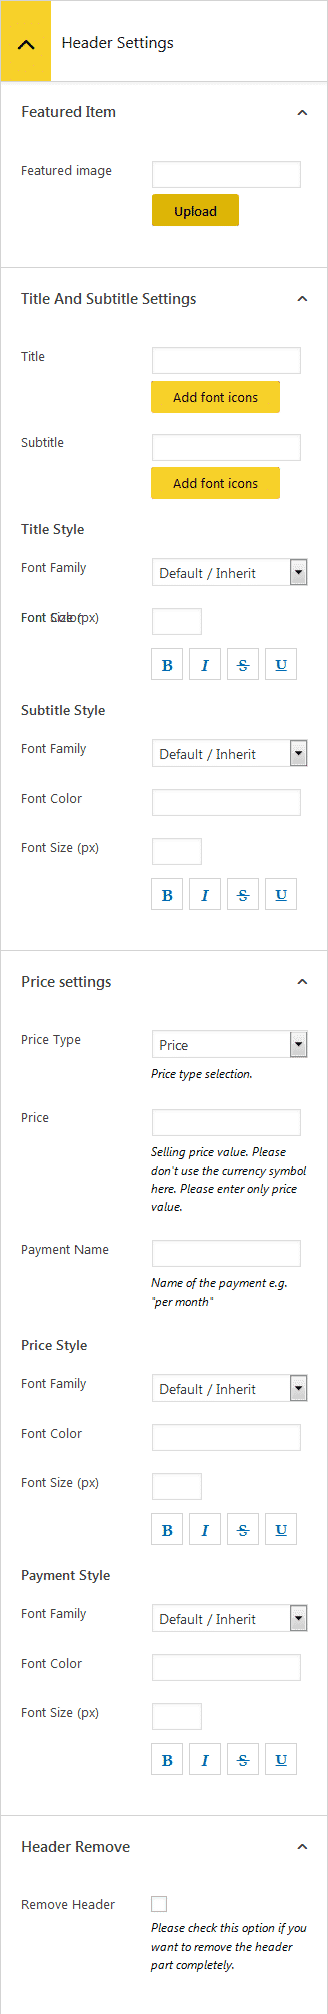 AP Pricing Tables Lite Column: Header Settings